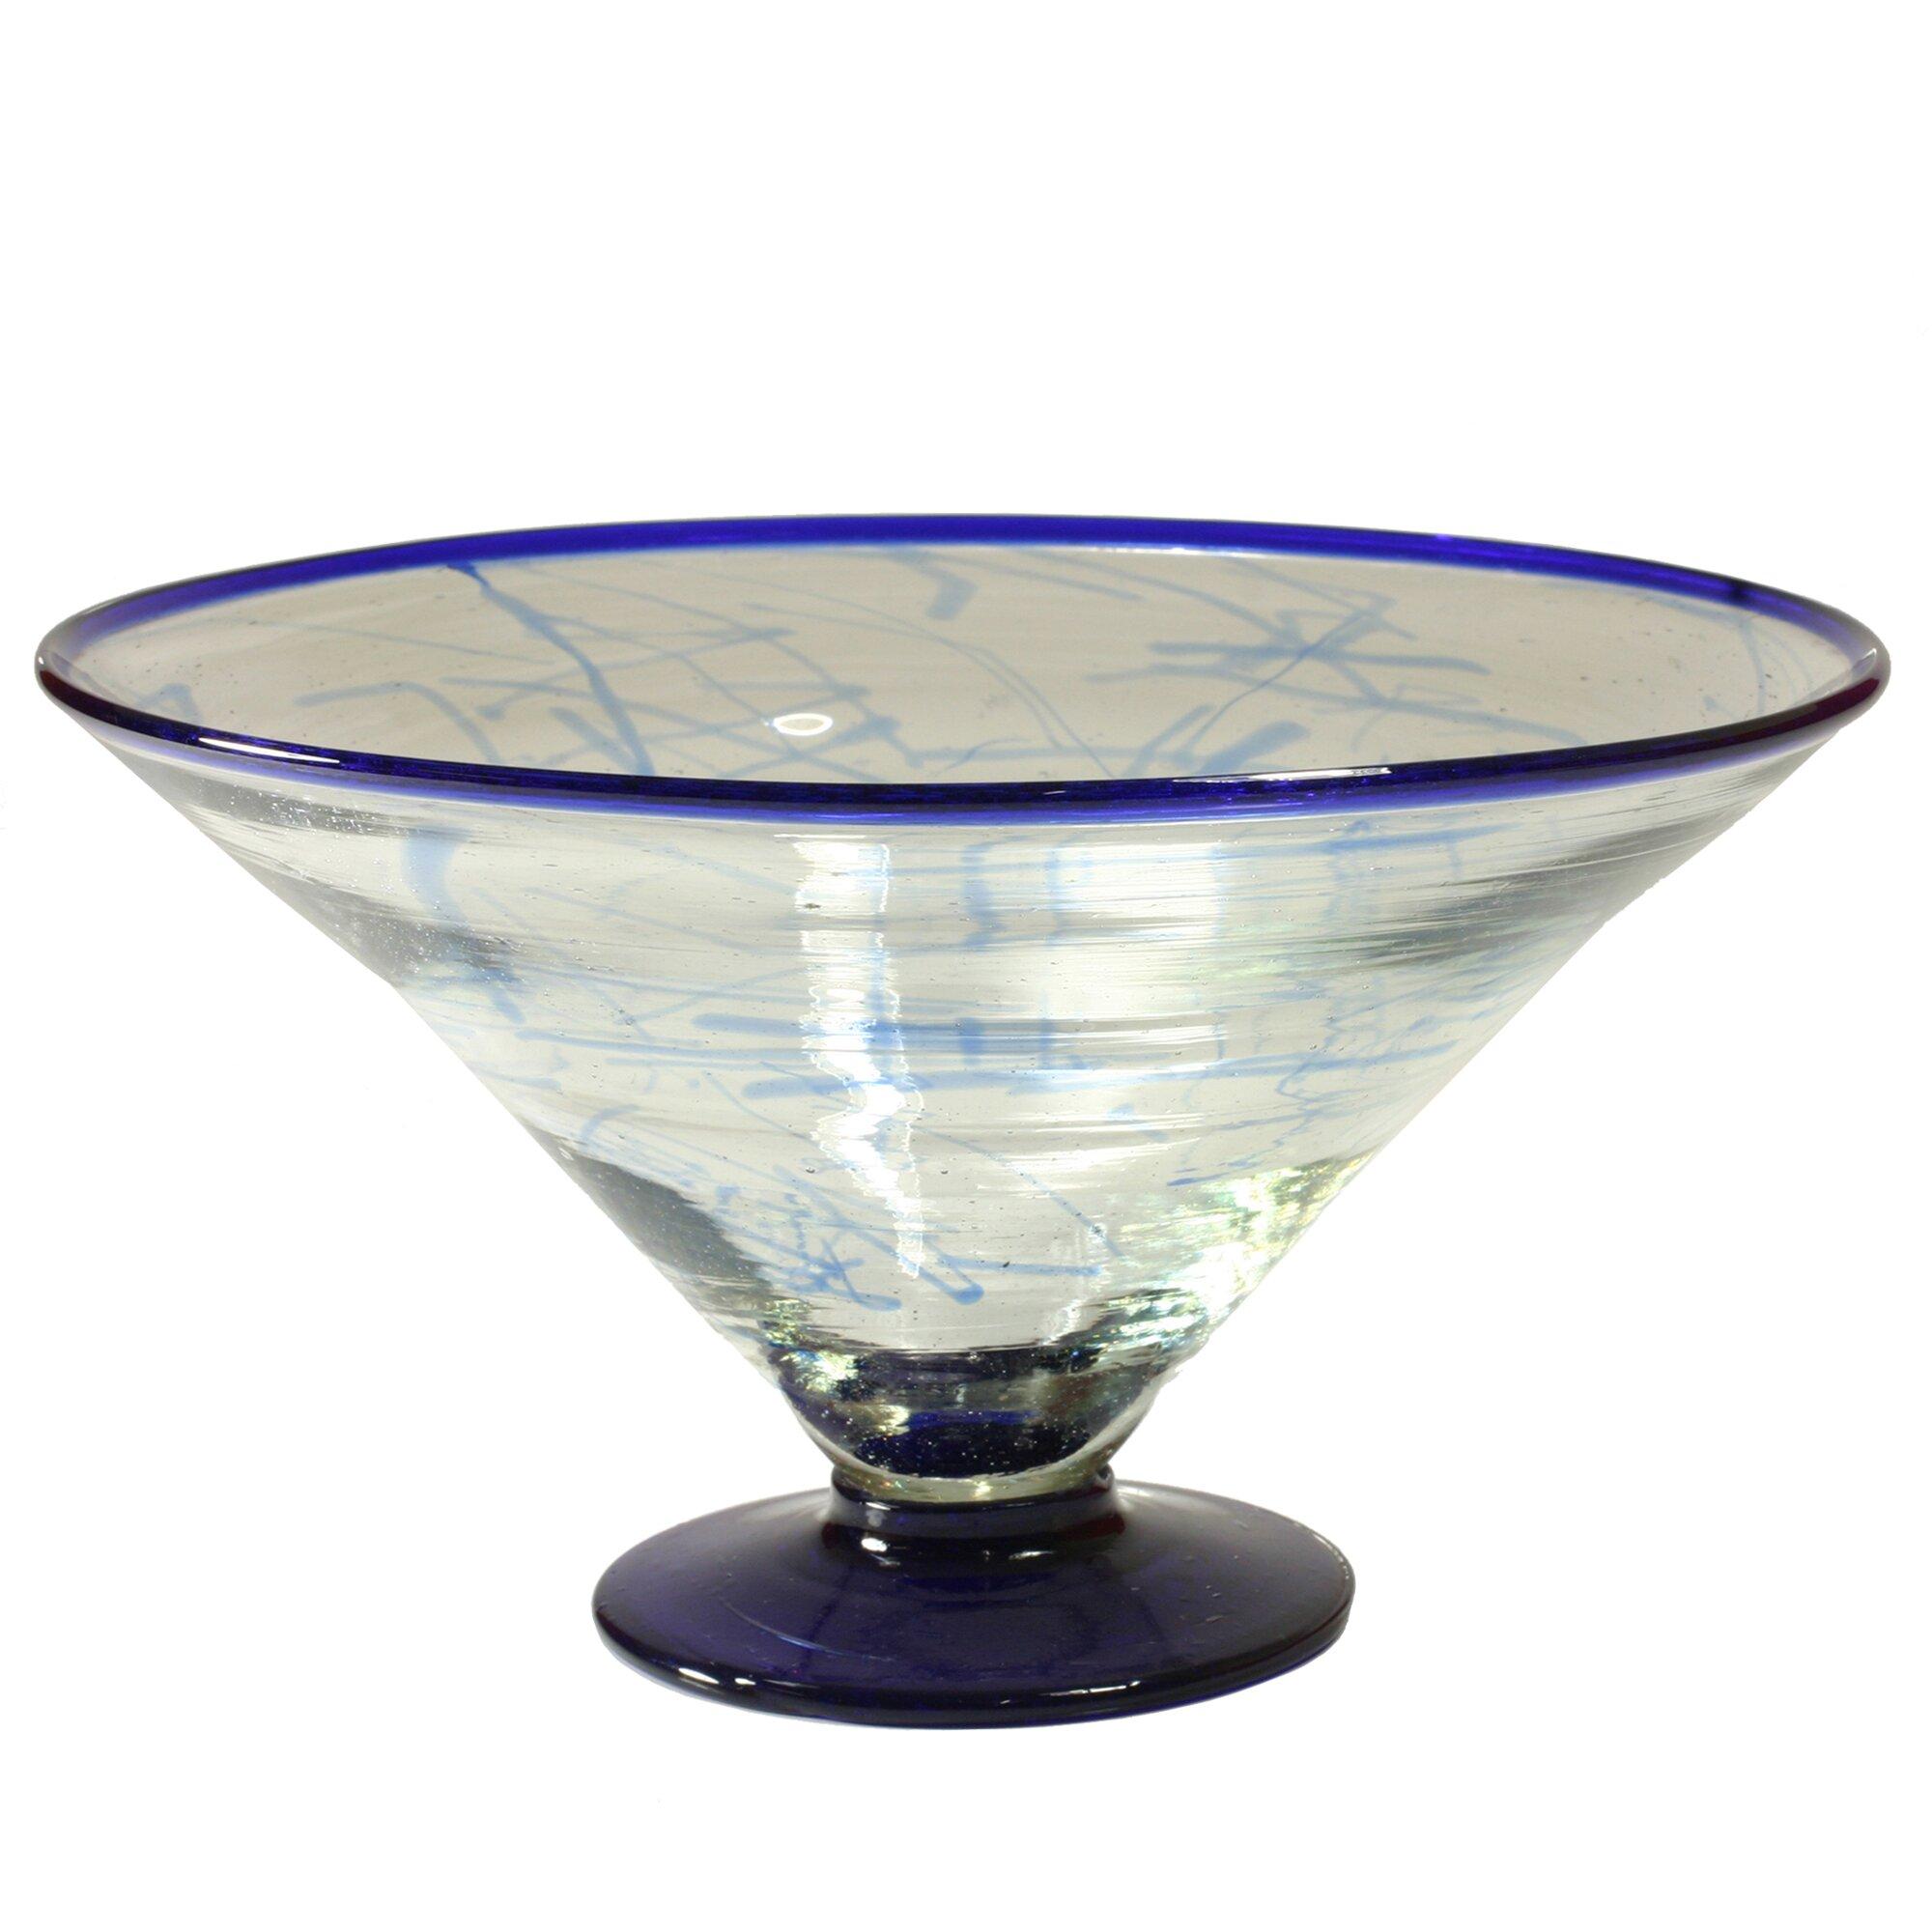 Novica cantel blown glass artisans decorative